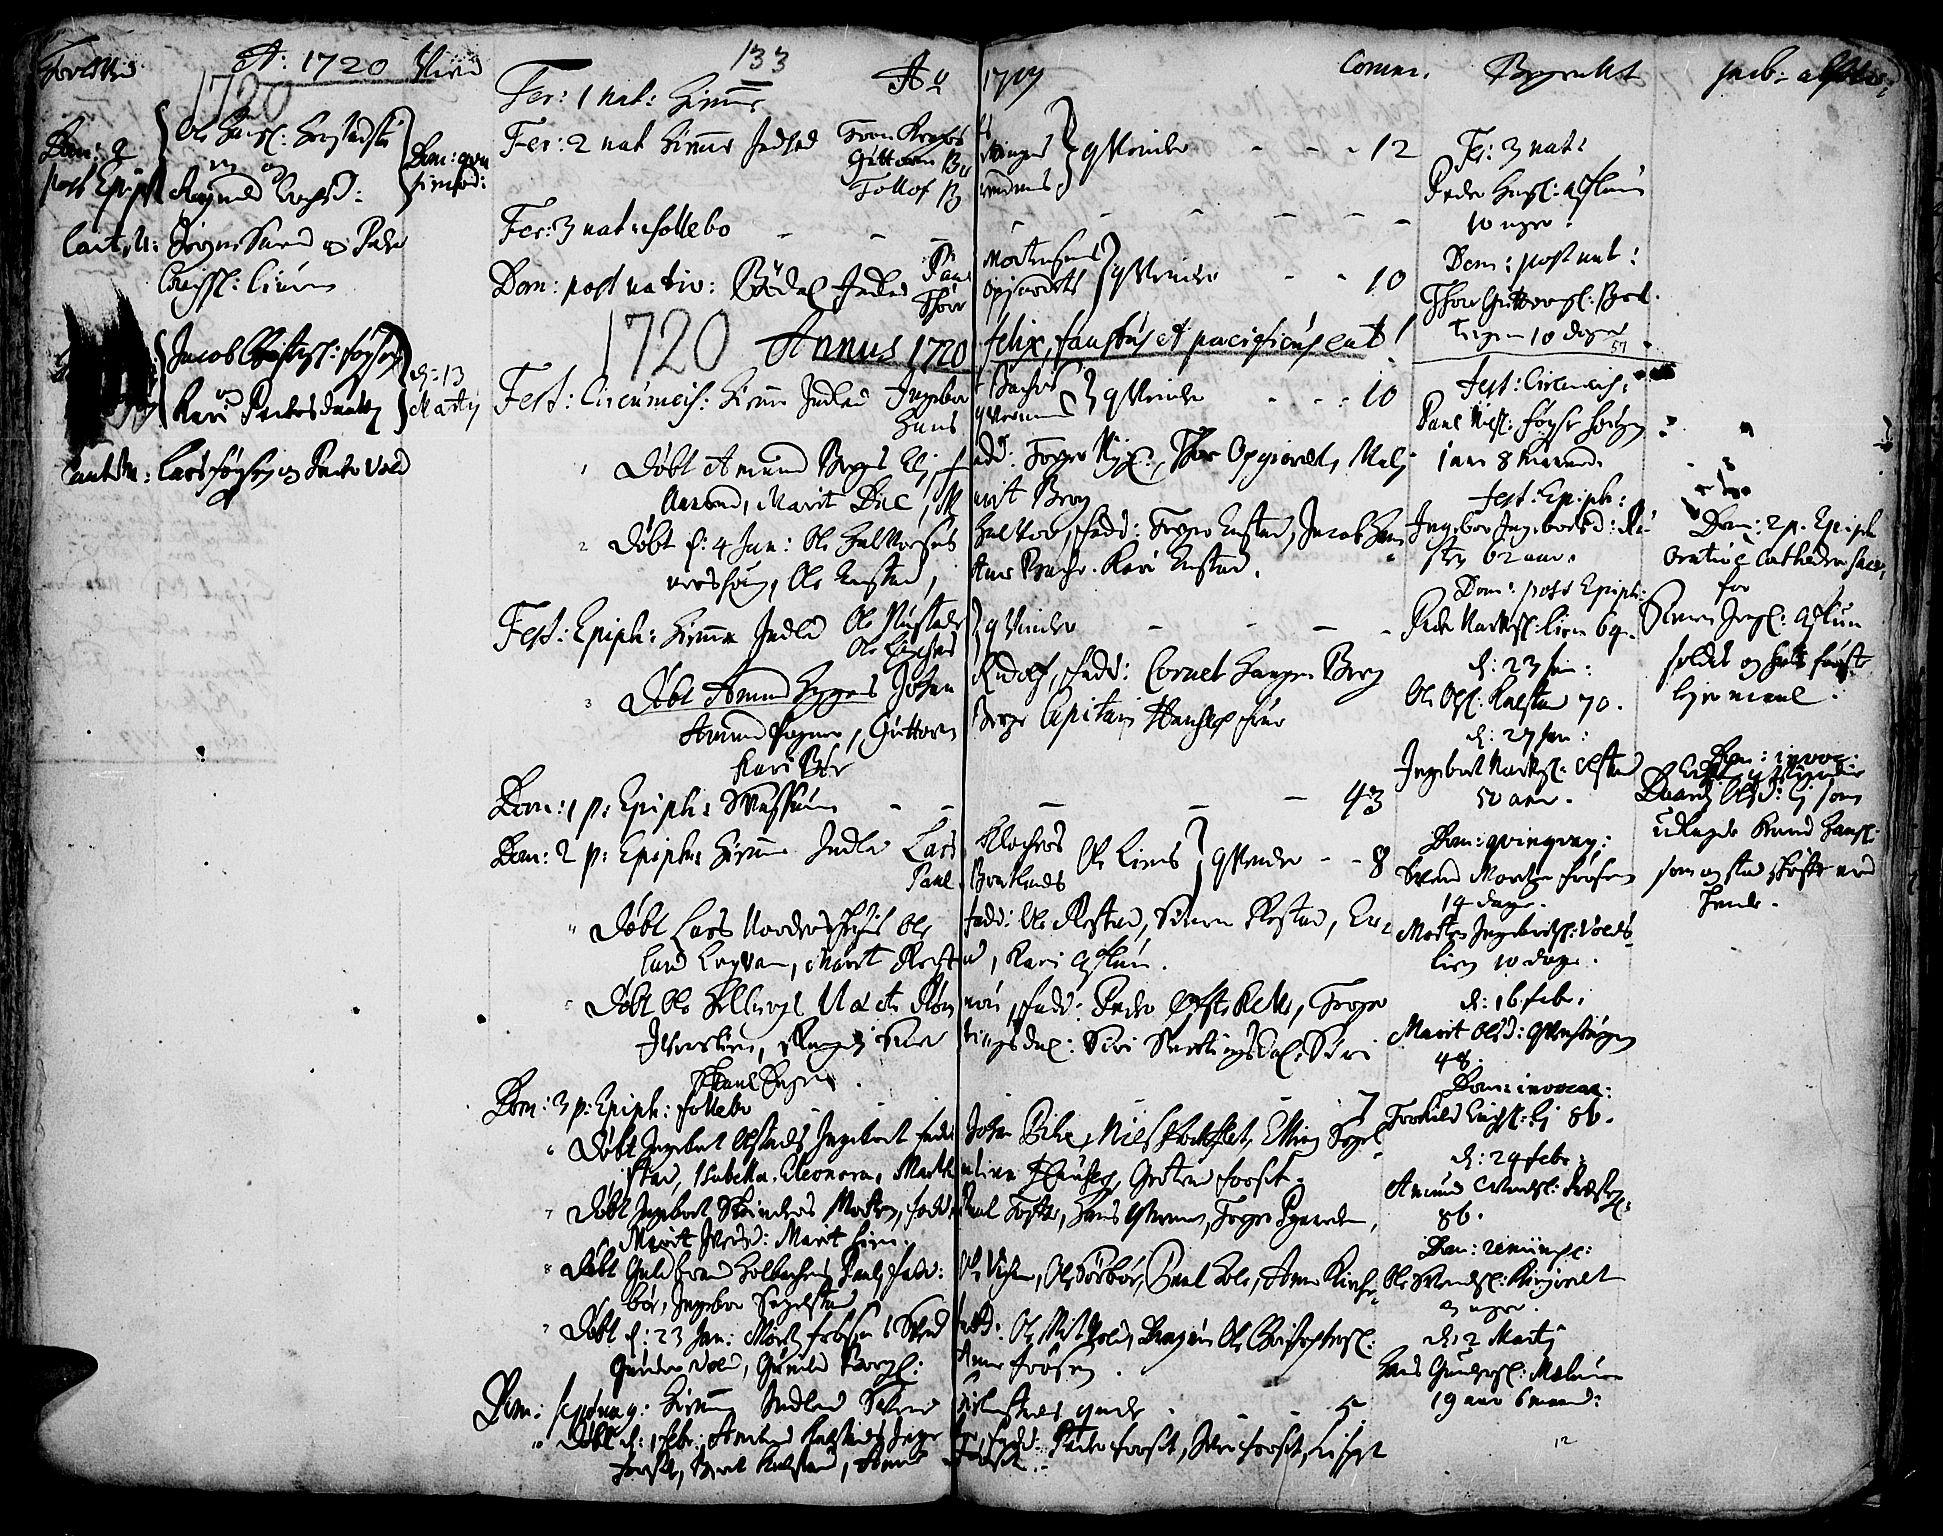 SAH, Gausdal prestekontor, Ministerialbok nr. 1, 1693-1728, s. 133